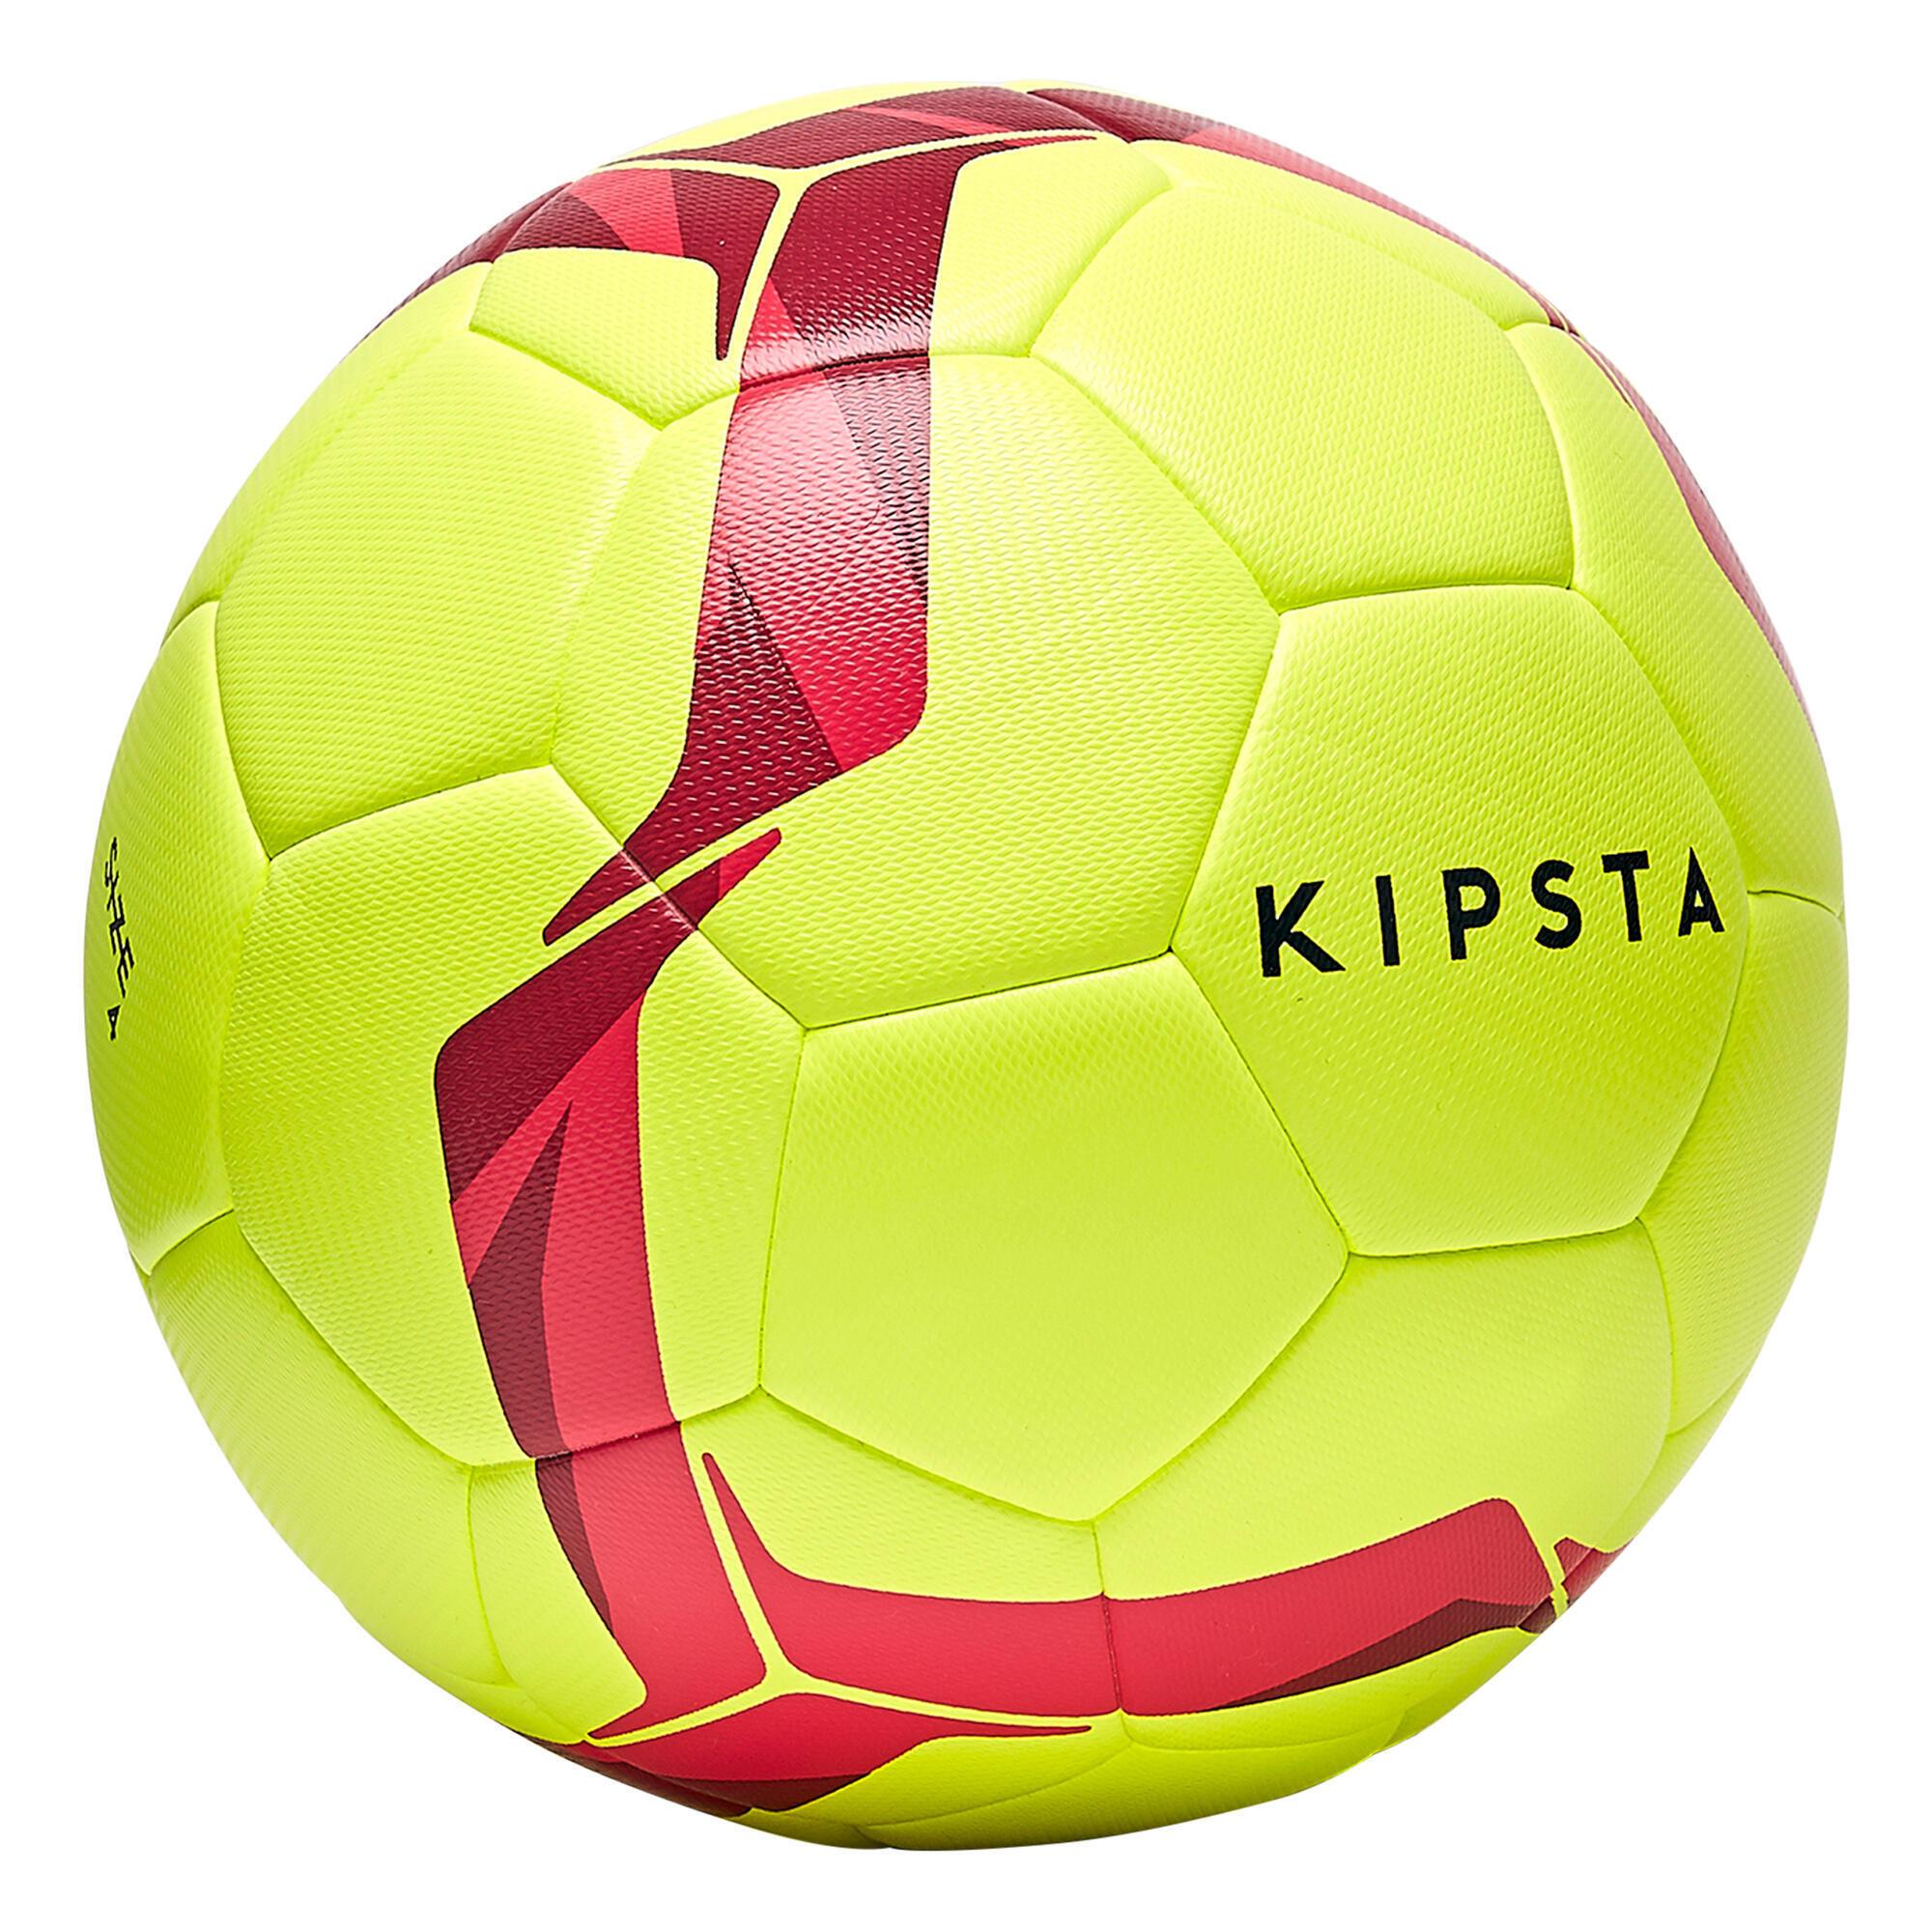 01eea33d3ca082 Gr Voetbal Accessoires Online Kopen - My Own Email